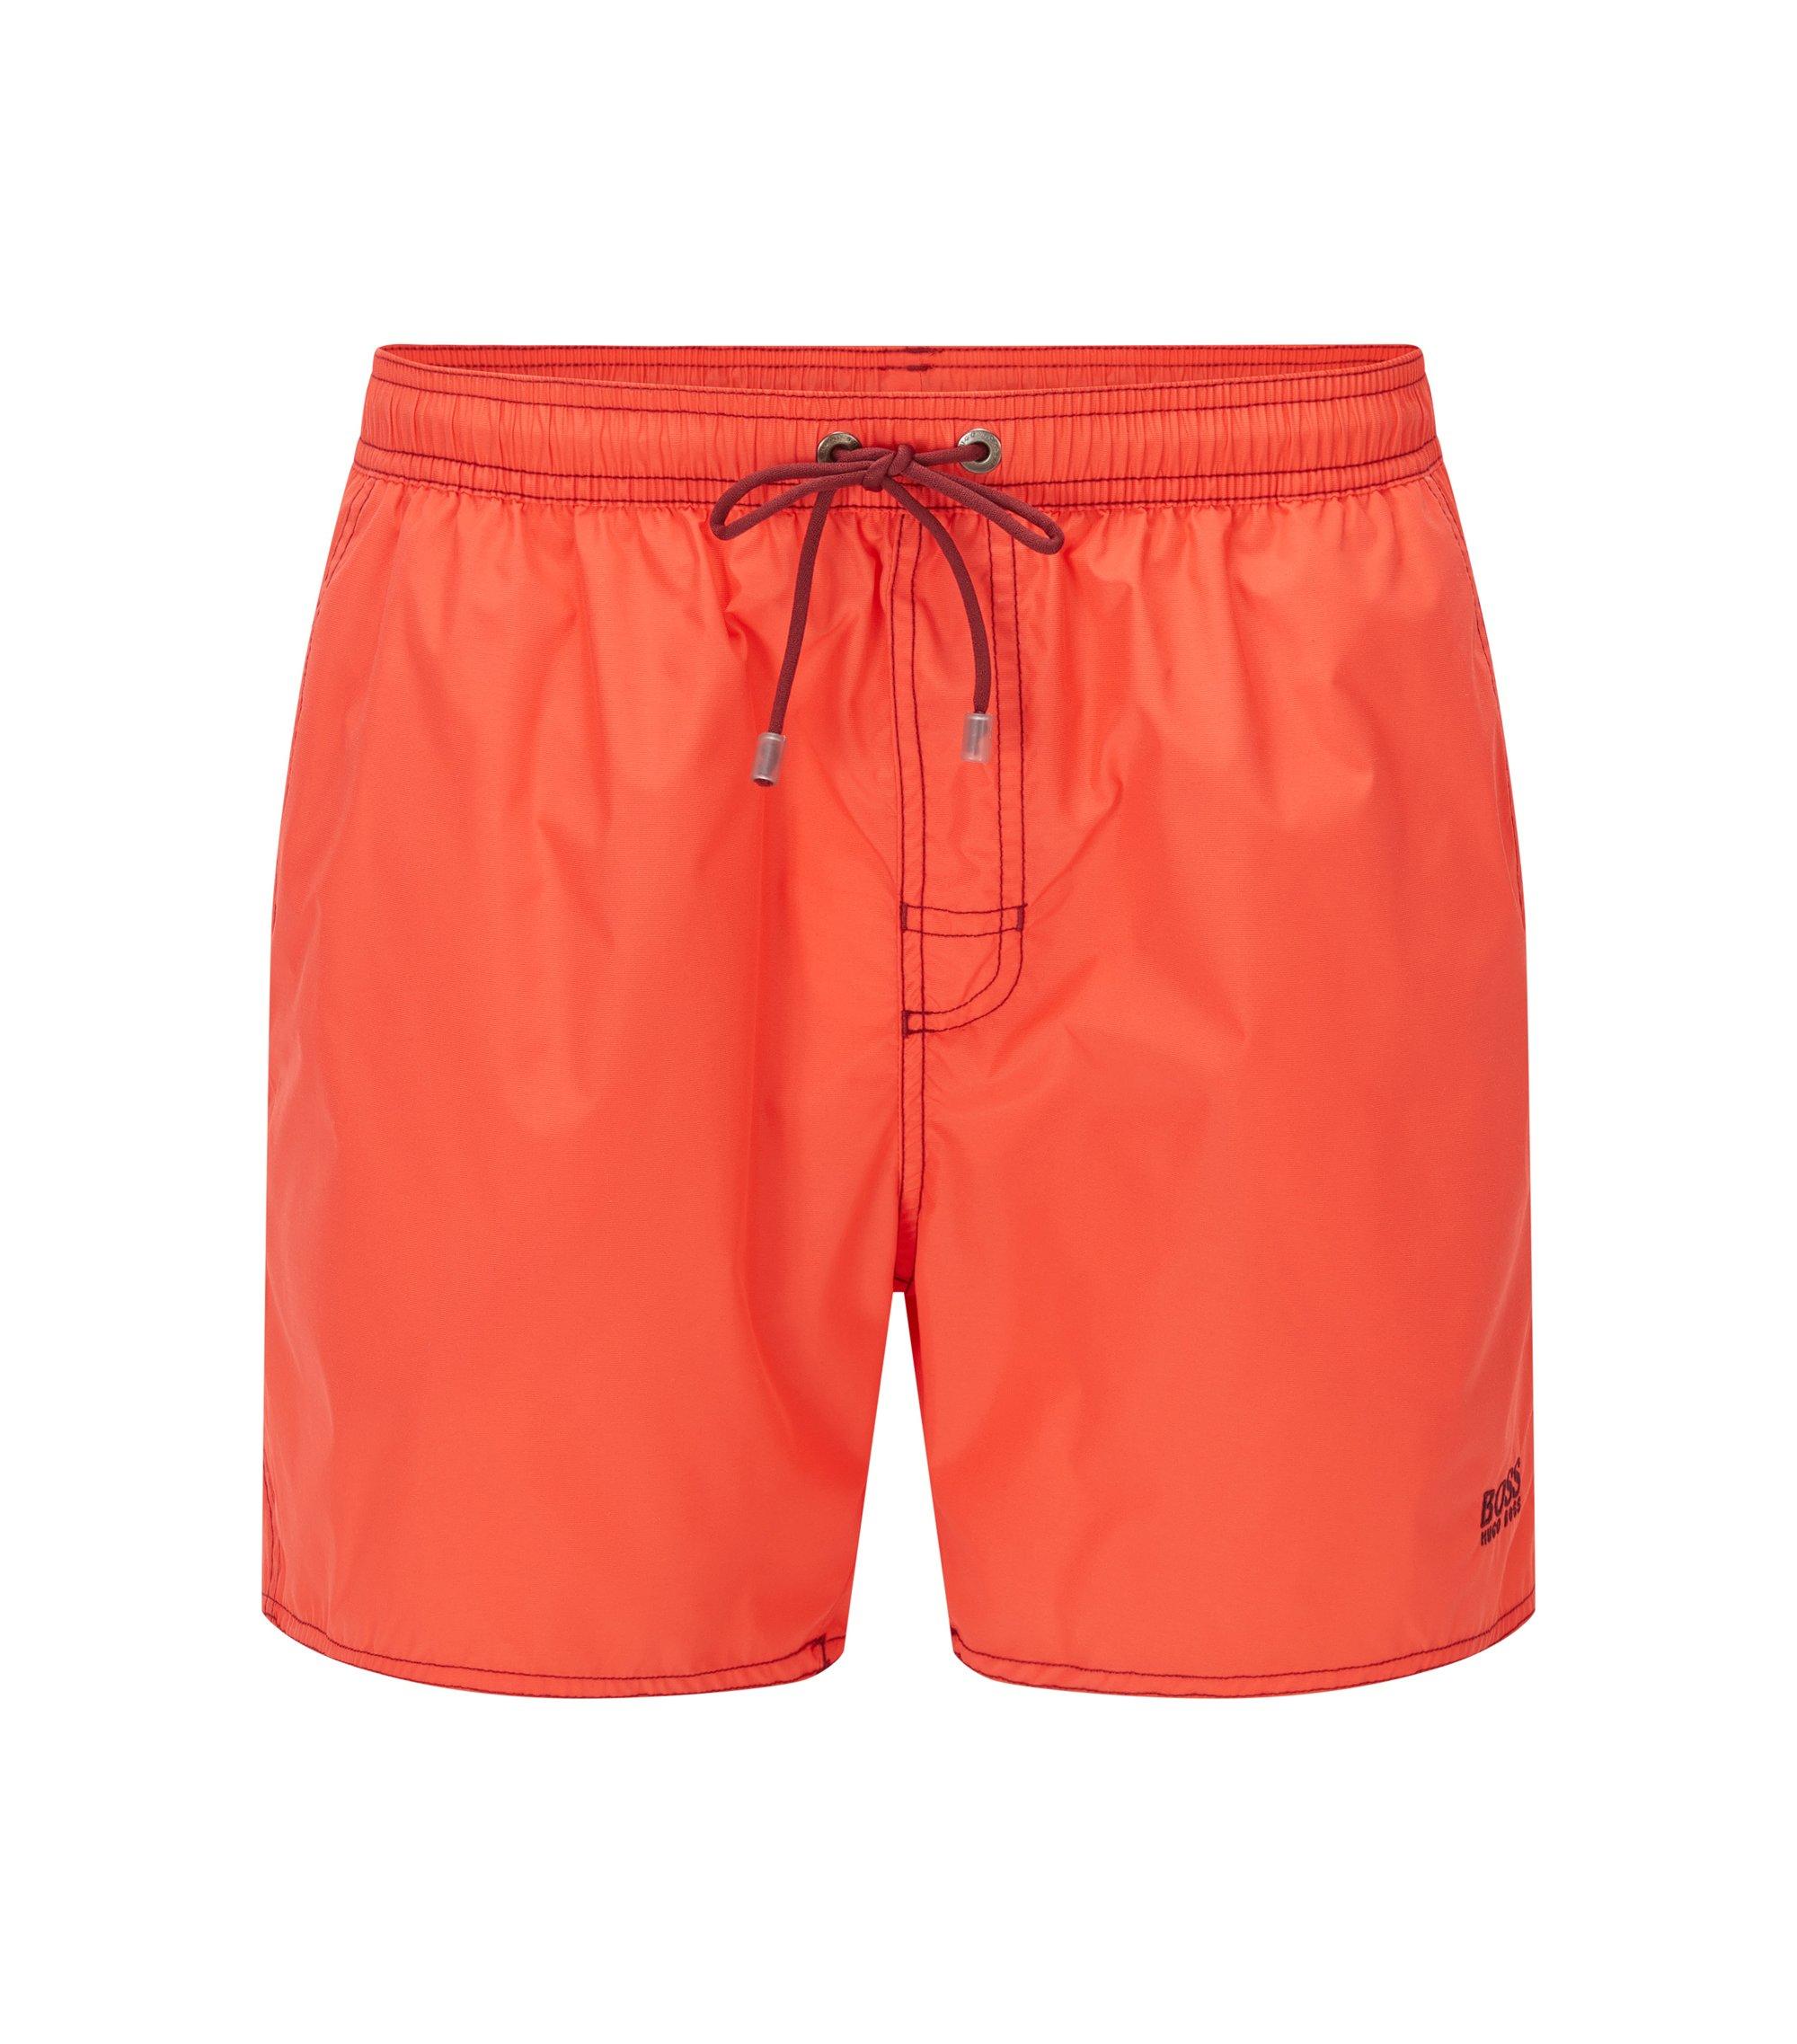 Quick Dry Swim Trunks | Lobster, Light Red